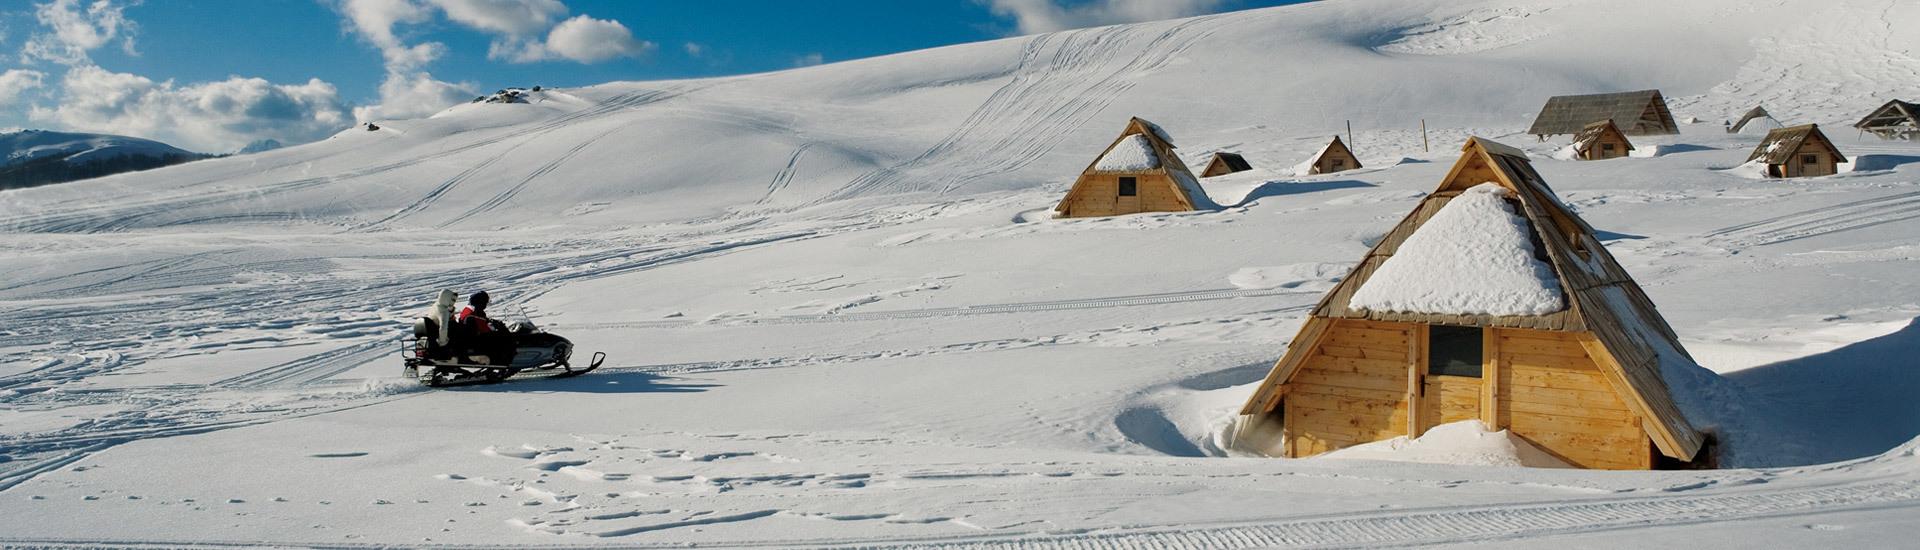 Top Urlaubsziele 2019: Montenegro im Winter